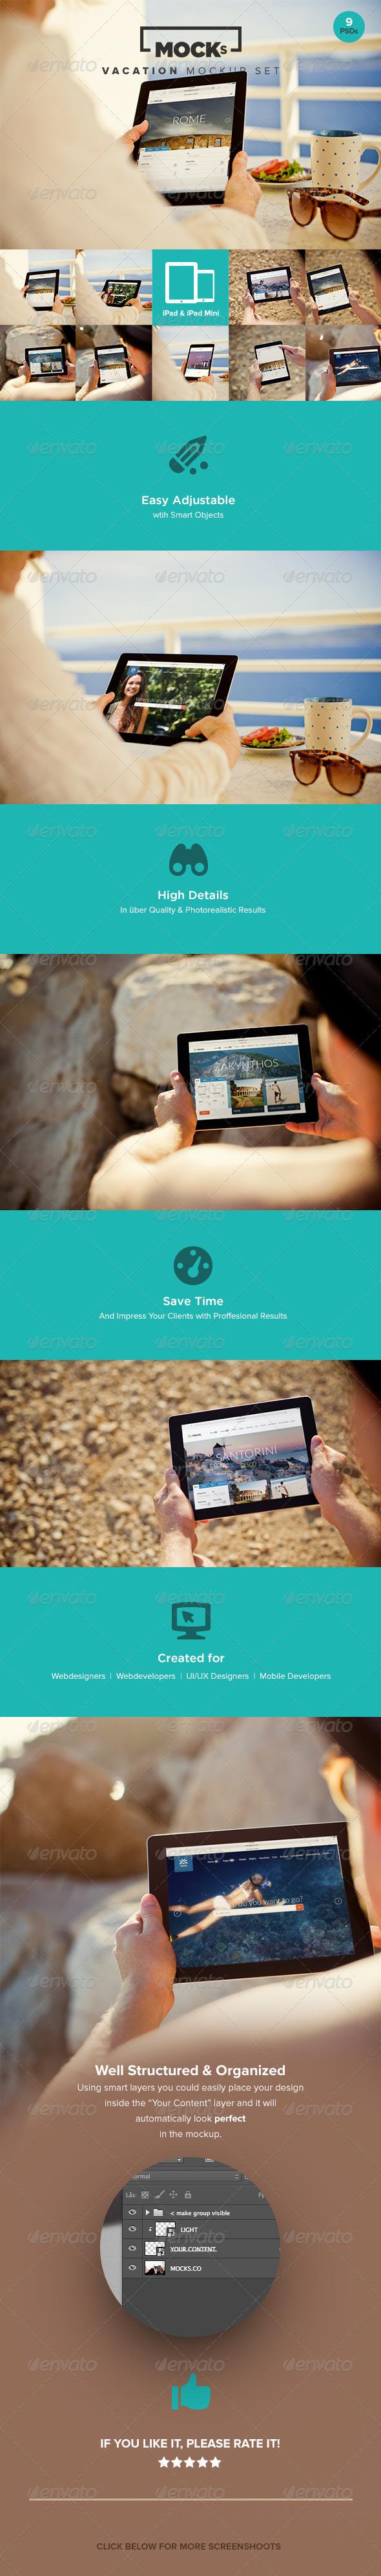 GraphicRiver Photorealistic iPad Mockup Templates 8230348